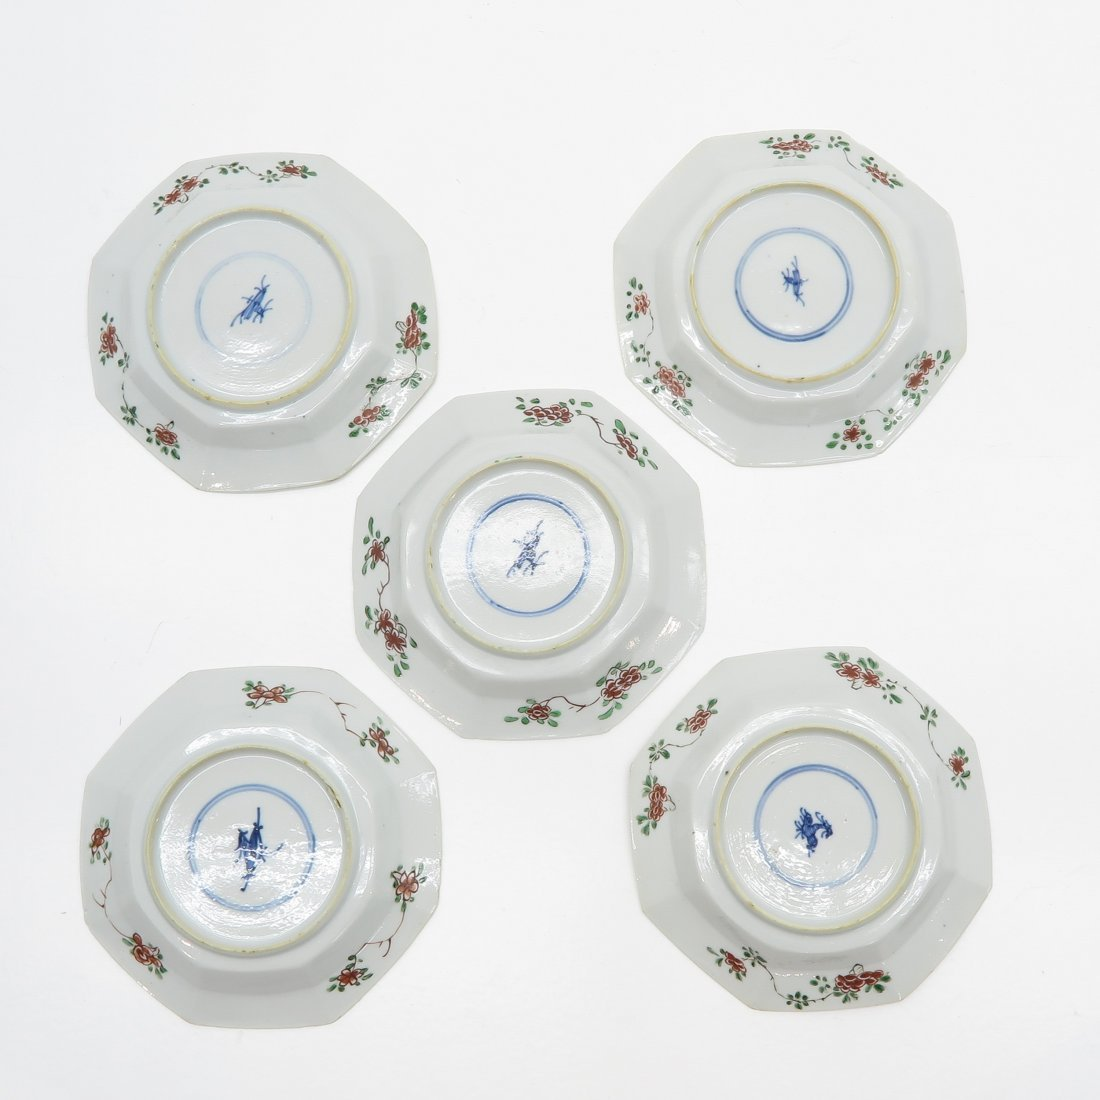 Lot of 5 Famille Verte China Porcelain Plates - 2